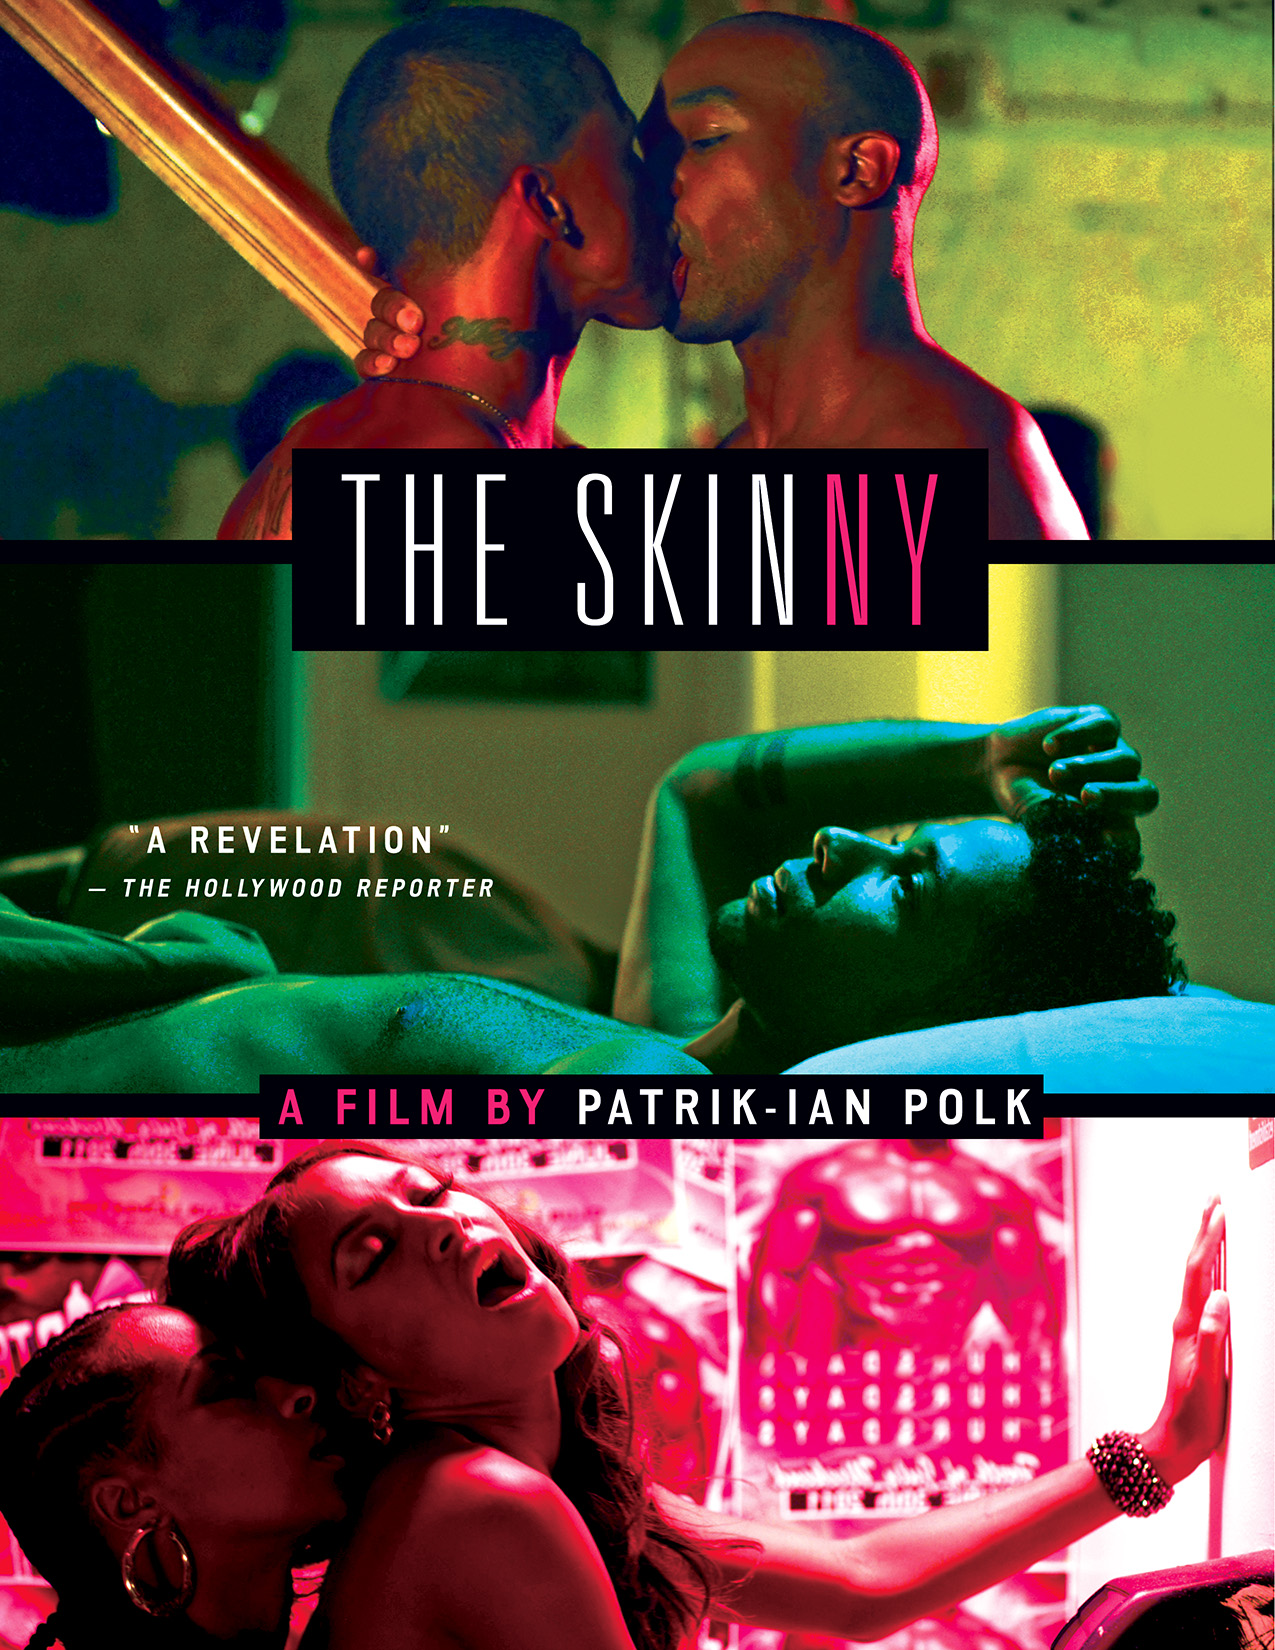 The Skinny (2012/I) Watch Full Movie Free Online